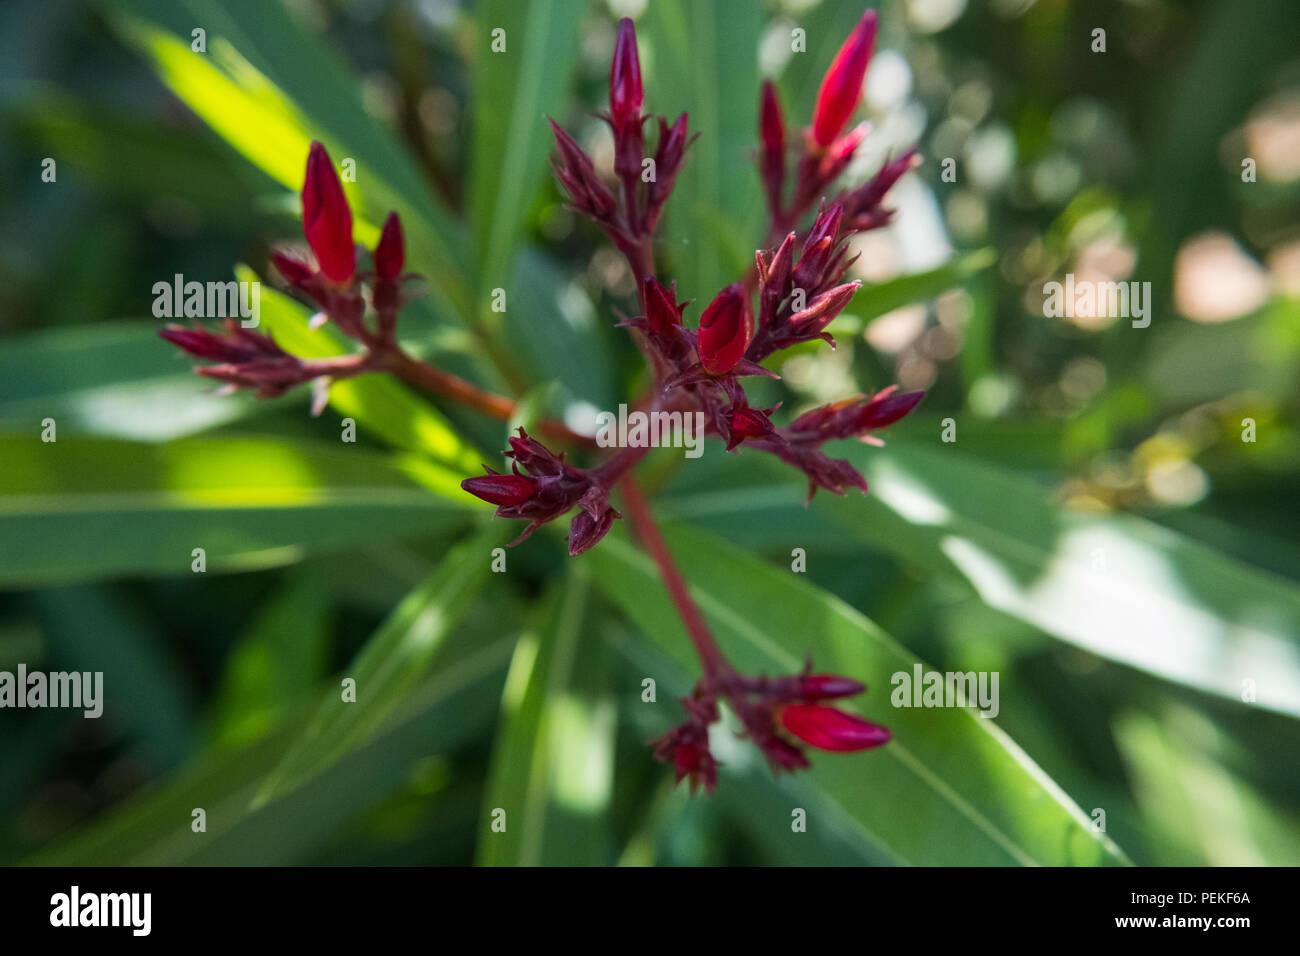 Buds Of Red Nerium Oleander Flower In A Green Garden Beautiful